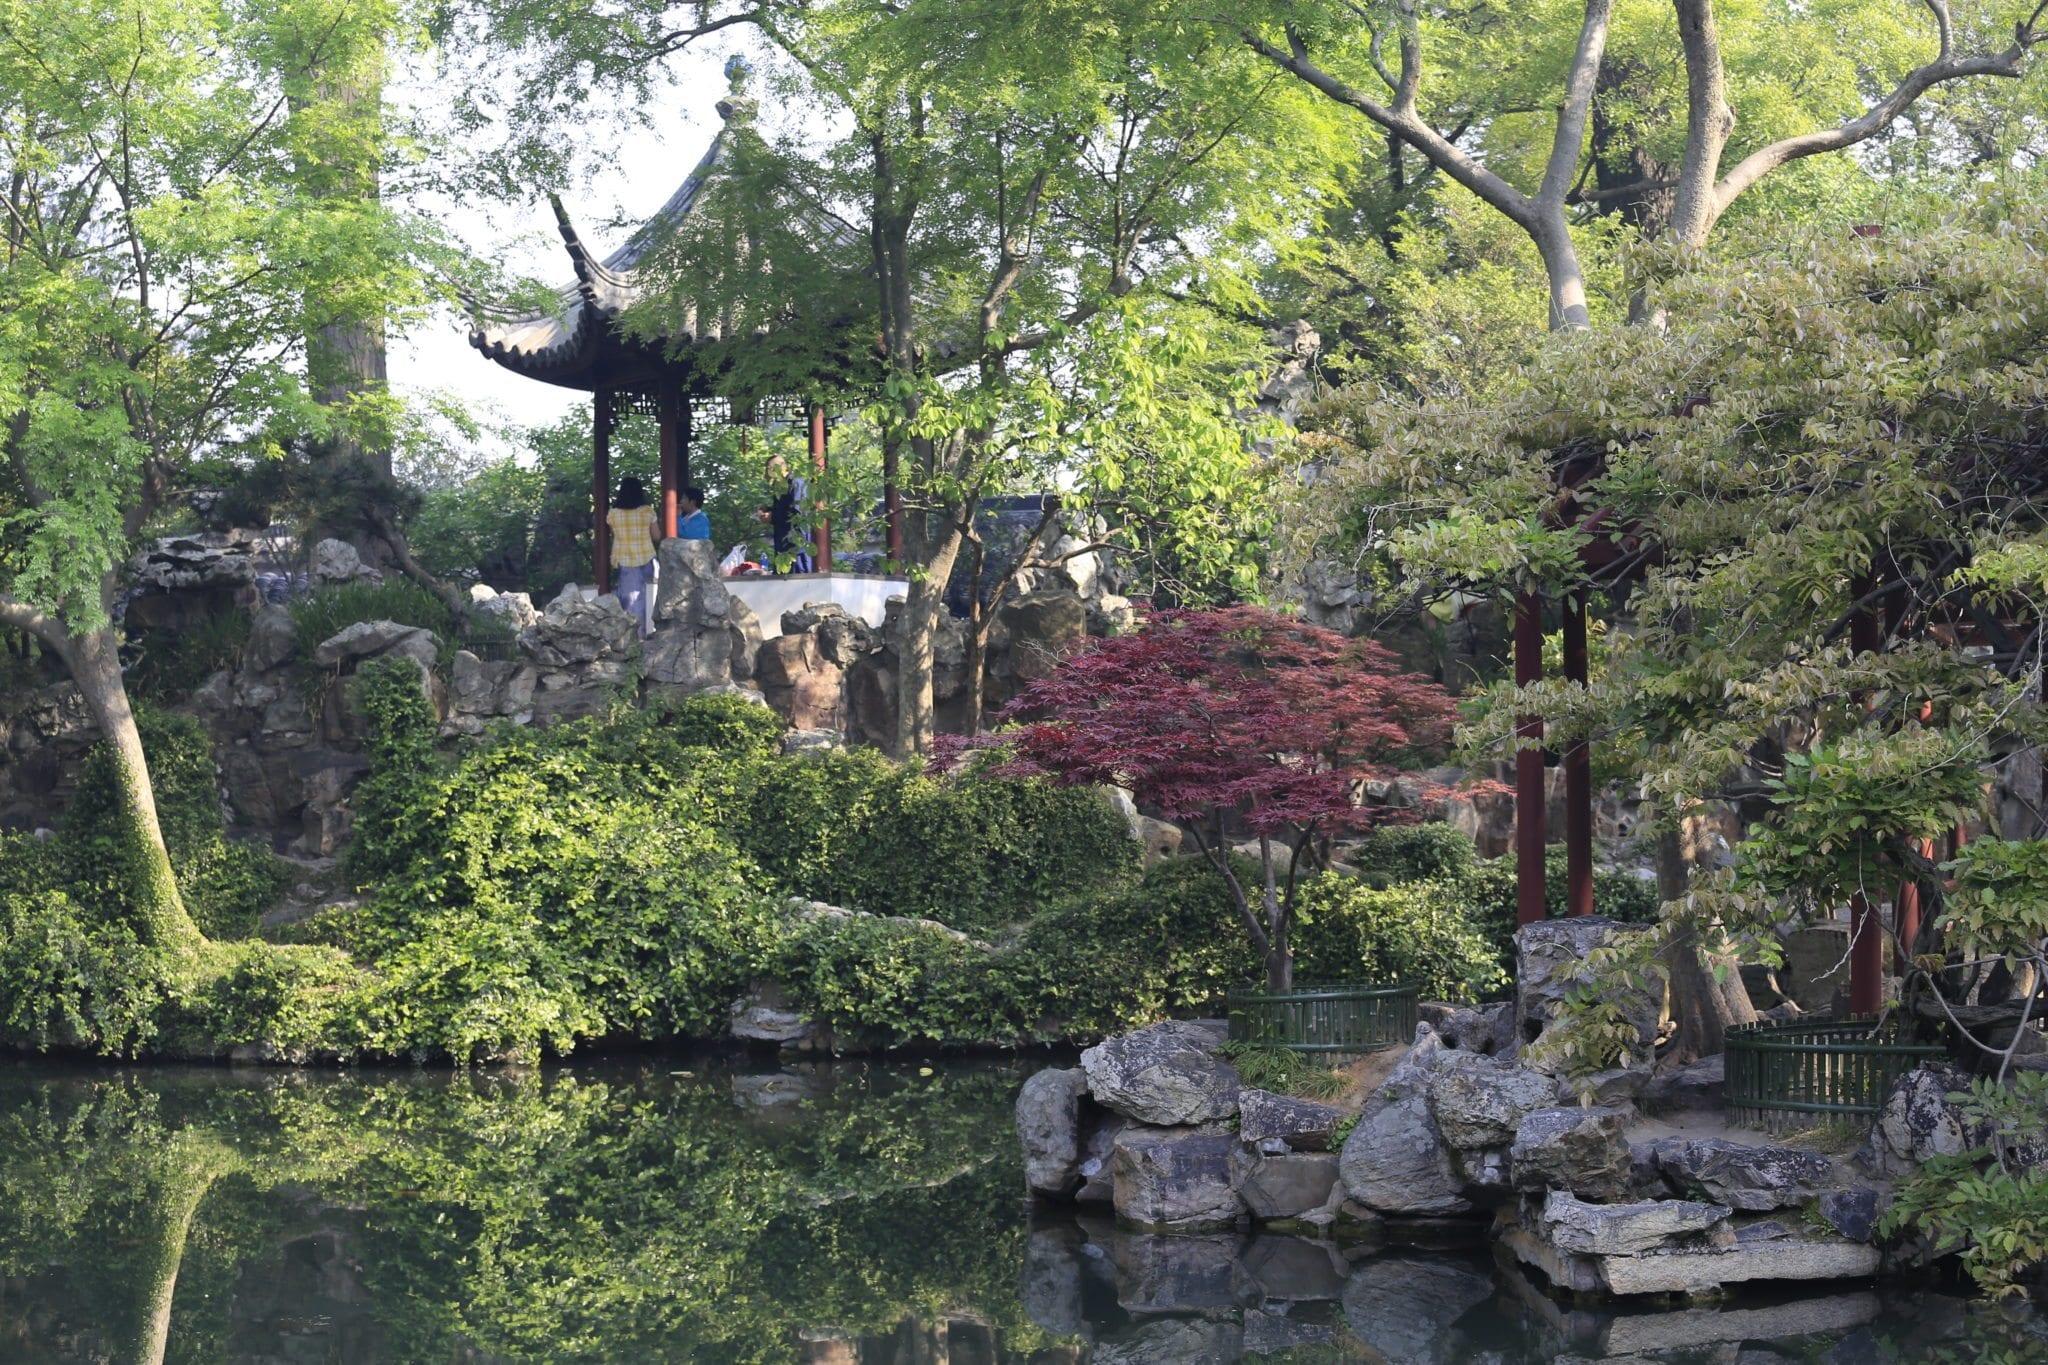 Sozhou, grad sa najlepšim baštama na svetu China-Suzhou-Lingering-Garden-mustseeplaceseu-1